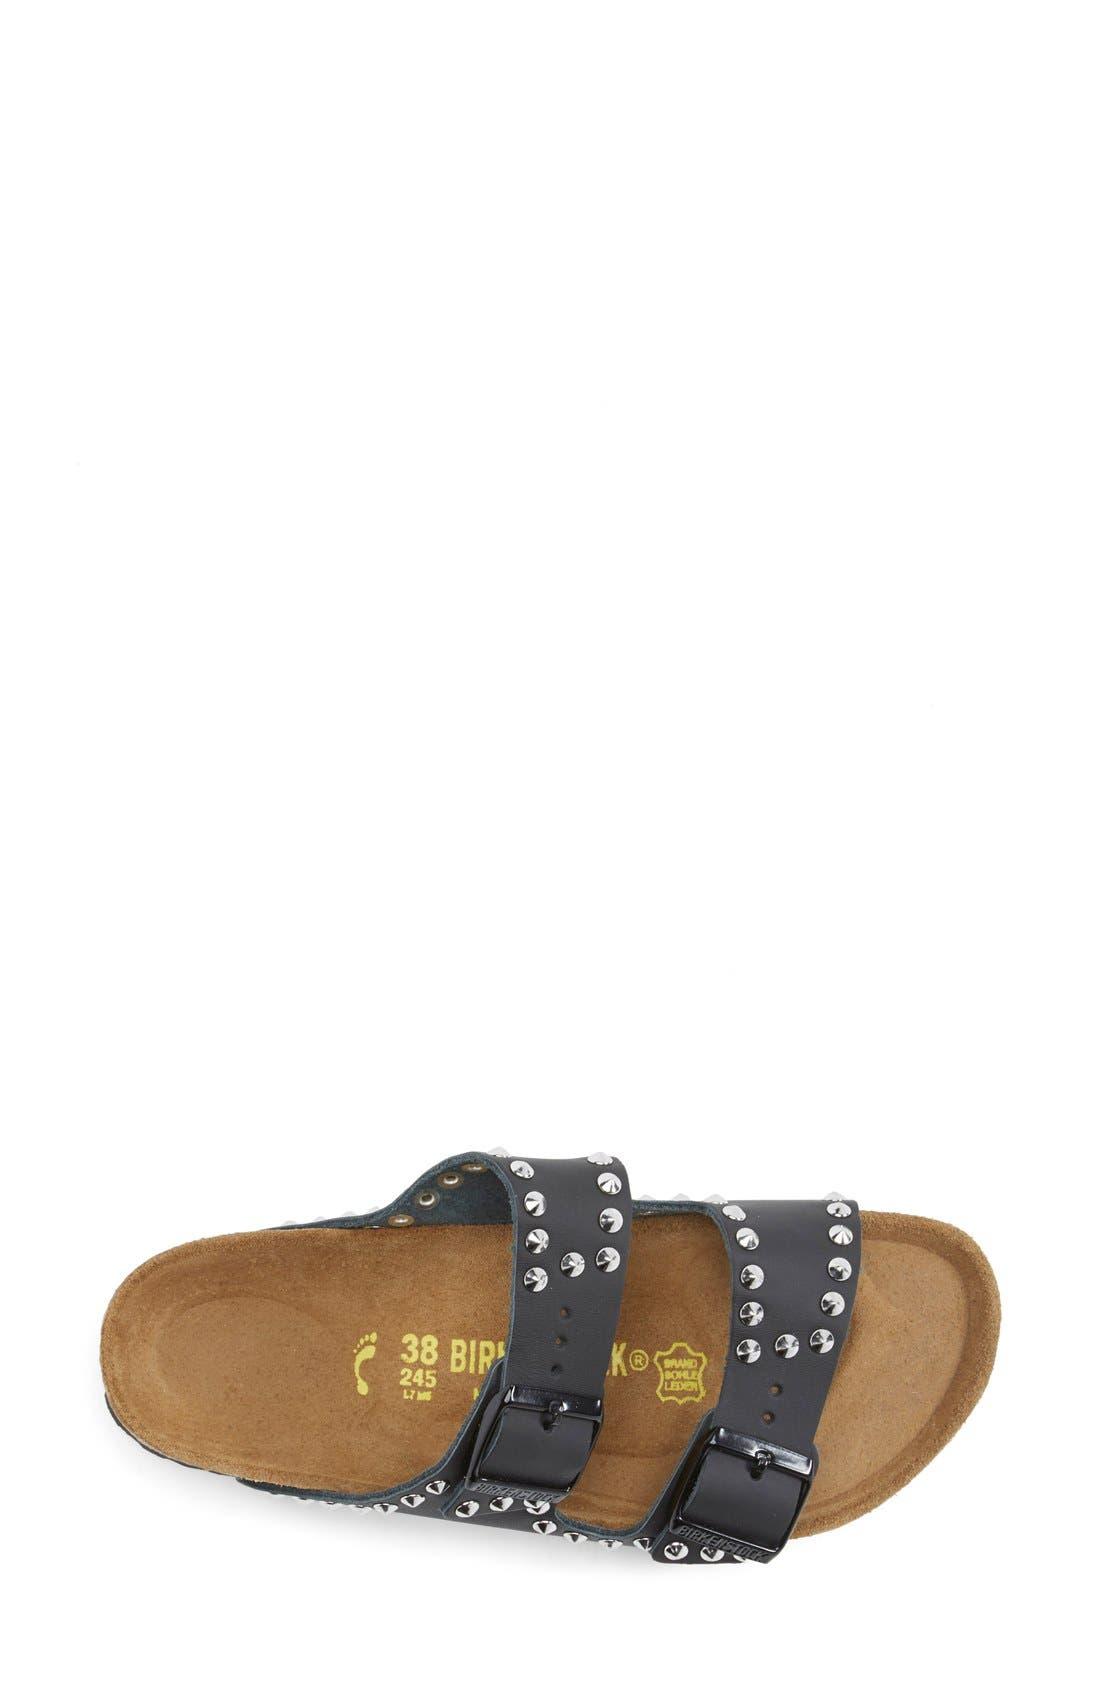 BIRKENSTOCK, 'Arizona' Studded Leather Sandal, Alternate thumbnail 4, color, 001